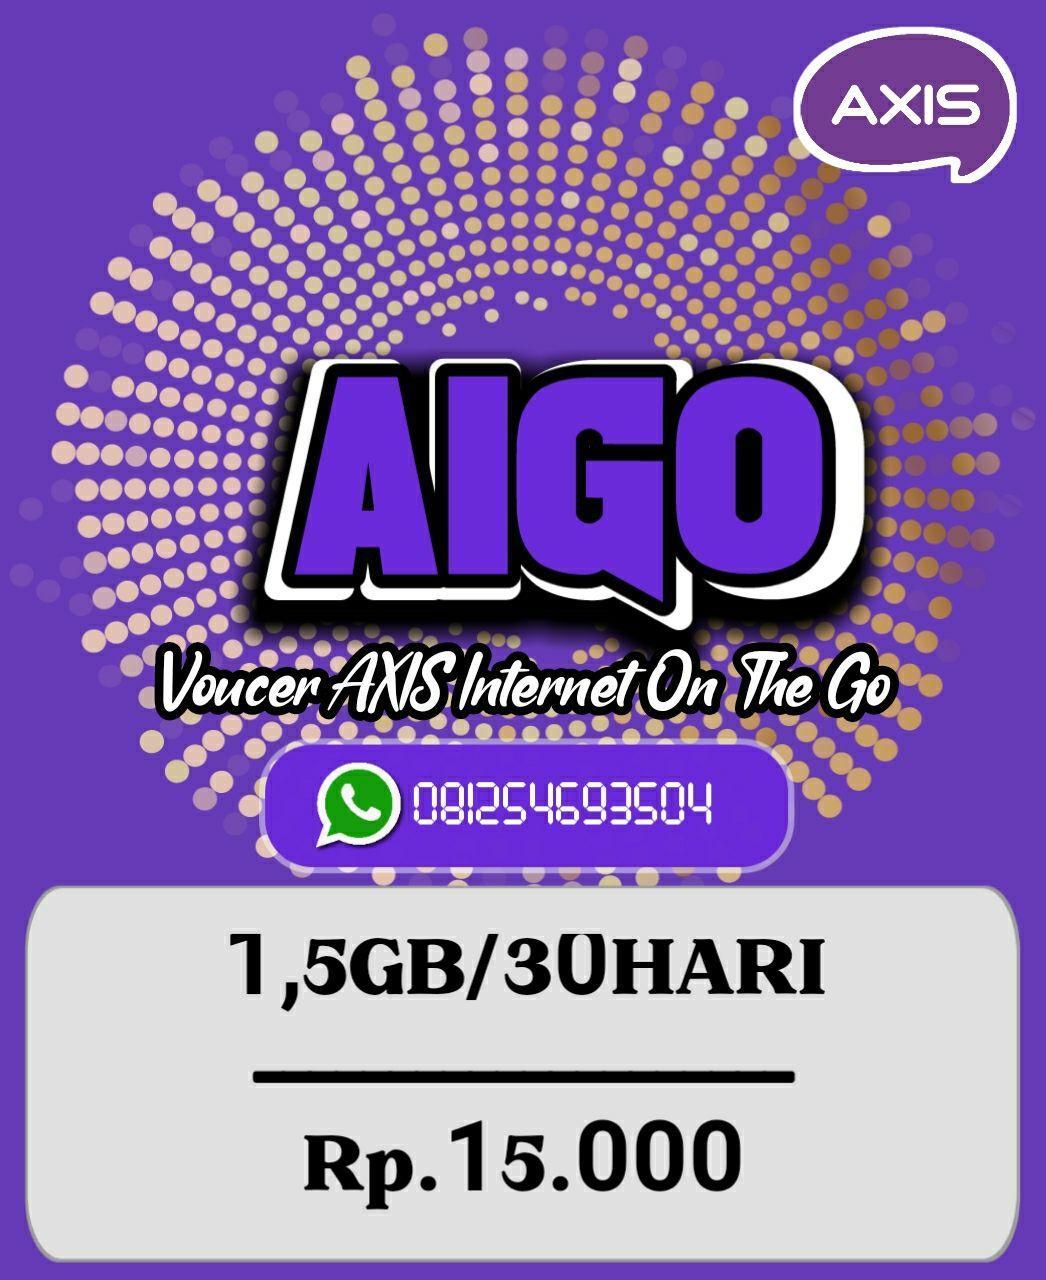 Voucer Axis 1,5GB/30HARI